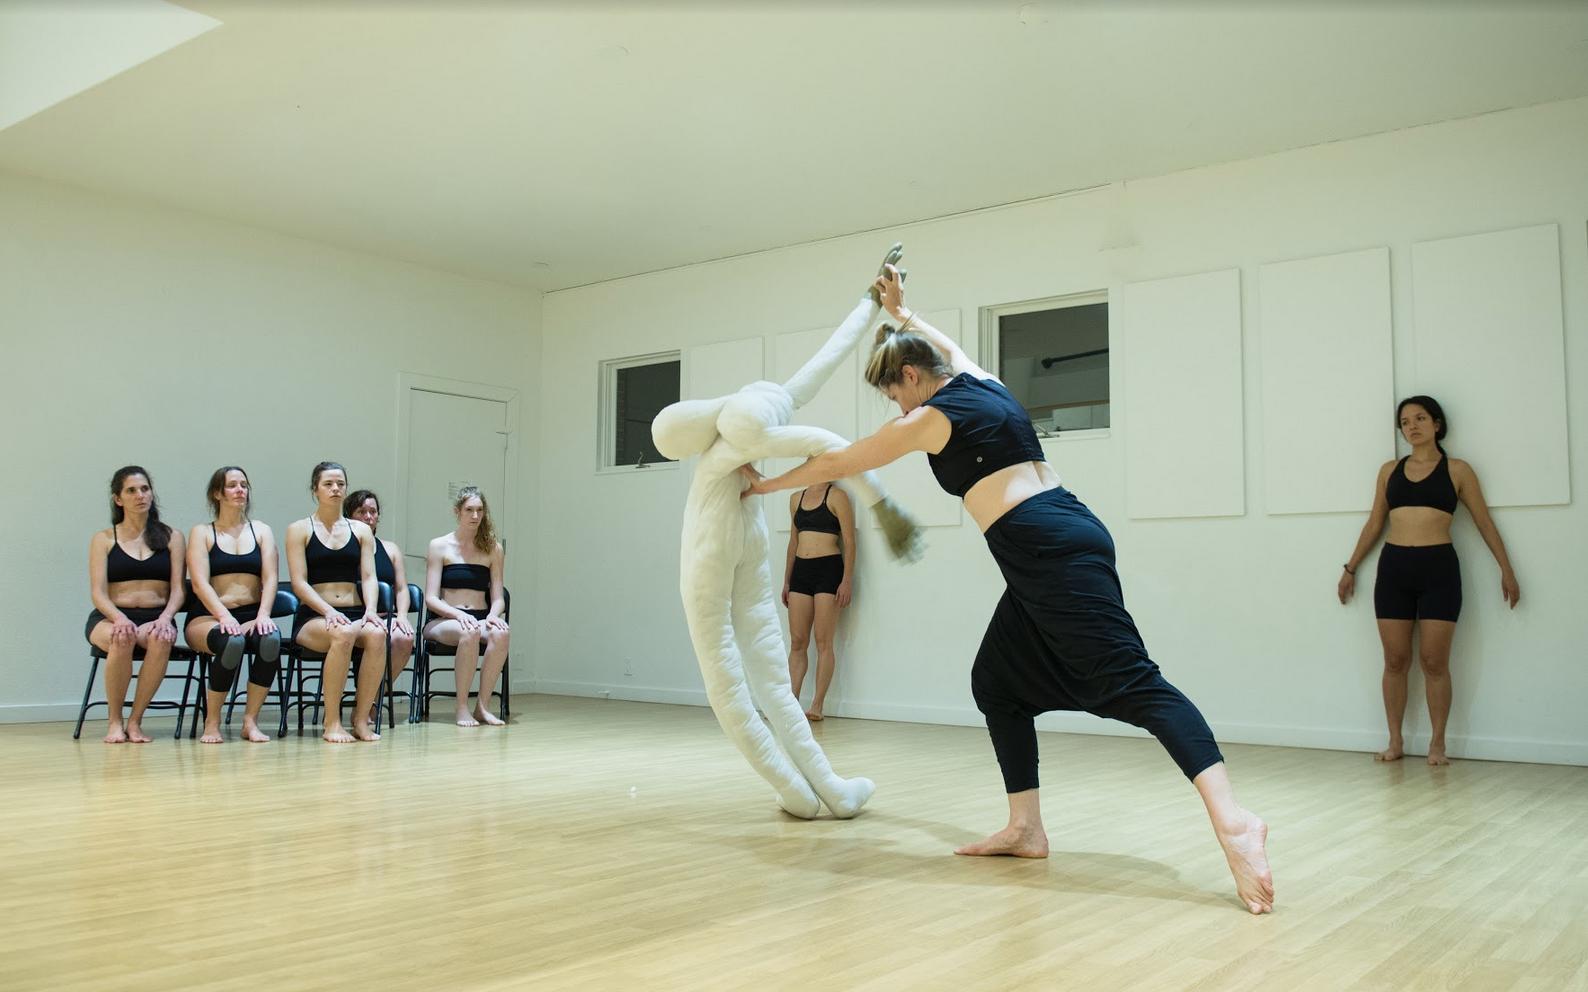 HEaRD performance (Alya Howe commission), Photo by Renee Ramge